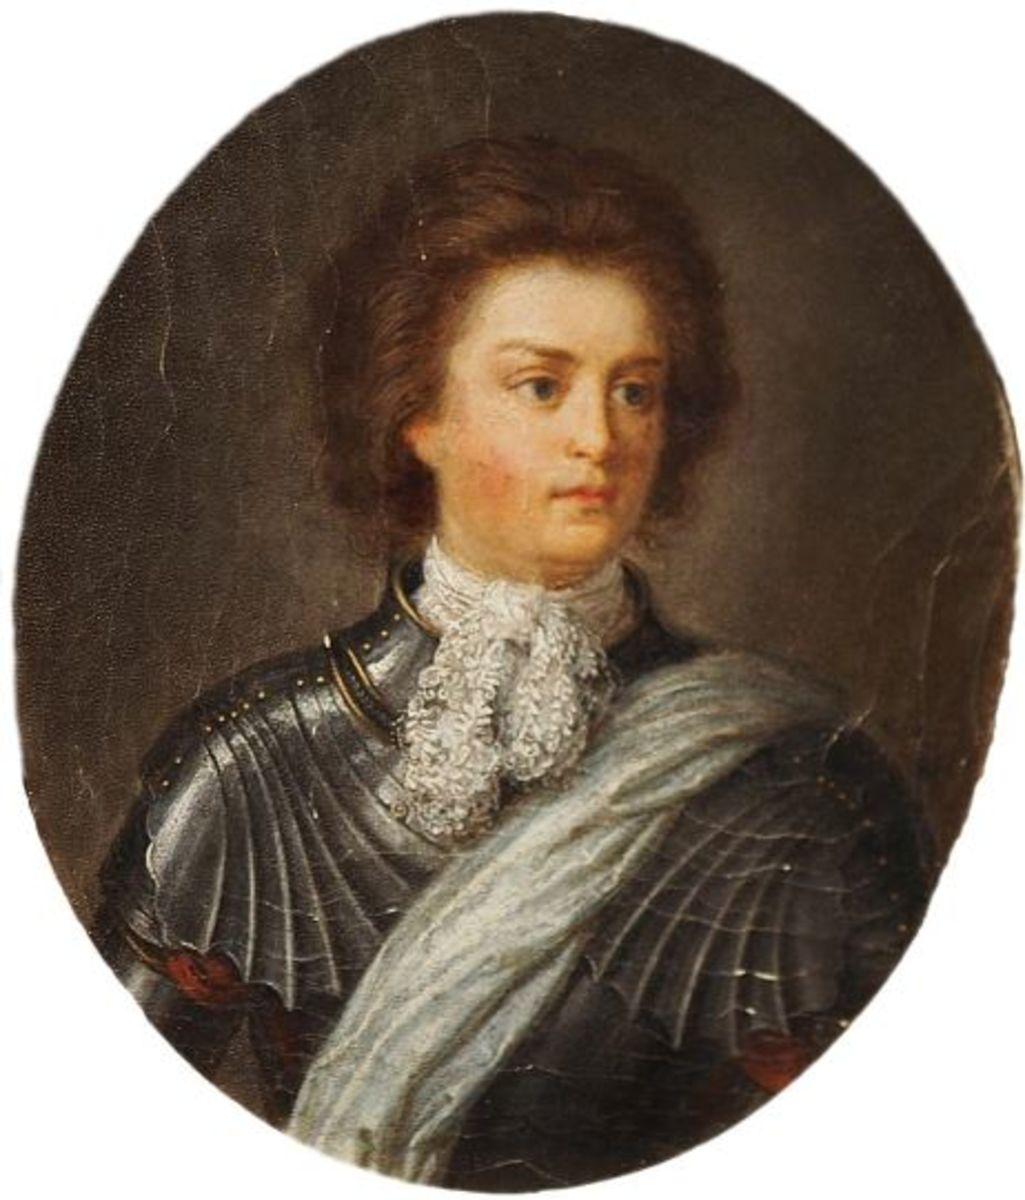 Sophia Dorothea's alleged lover. The missing-murdered soldier Philip Christoph von Konigsmarck.